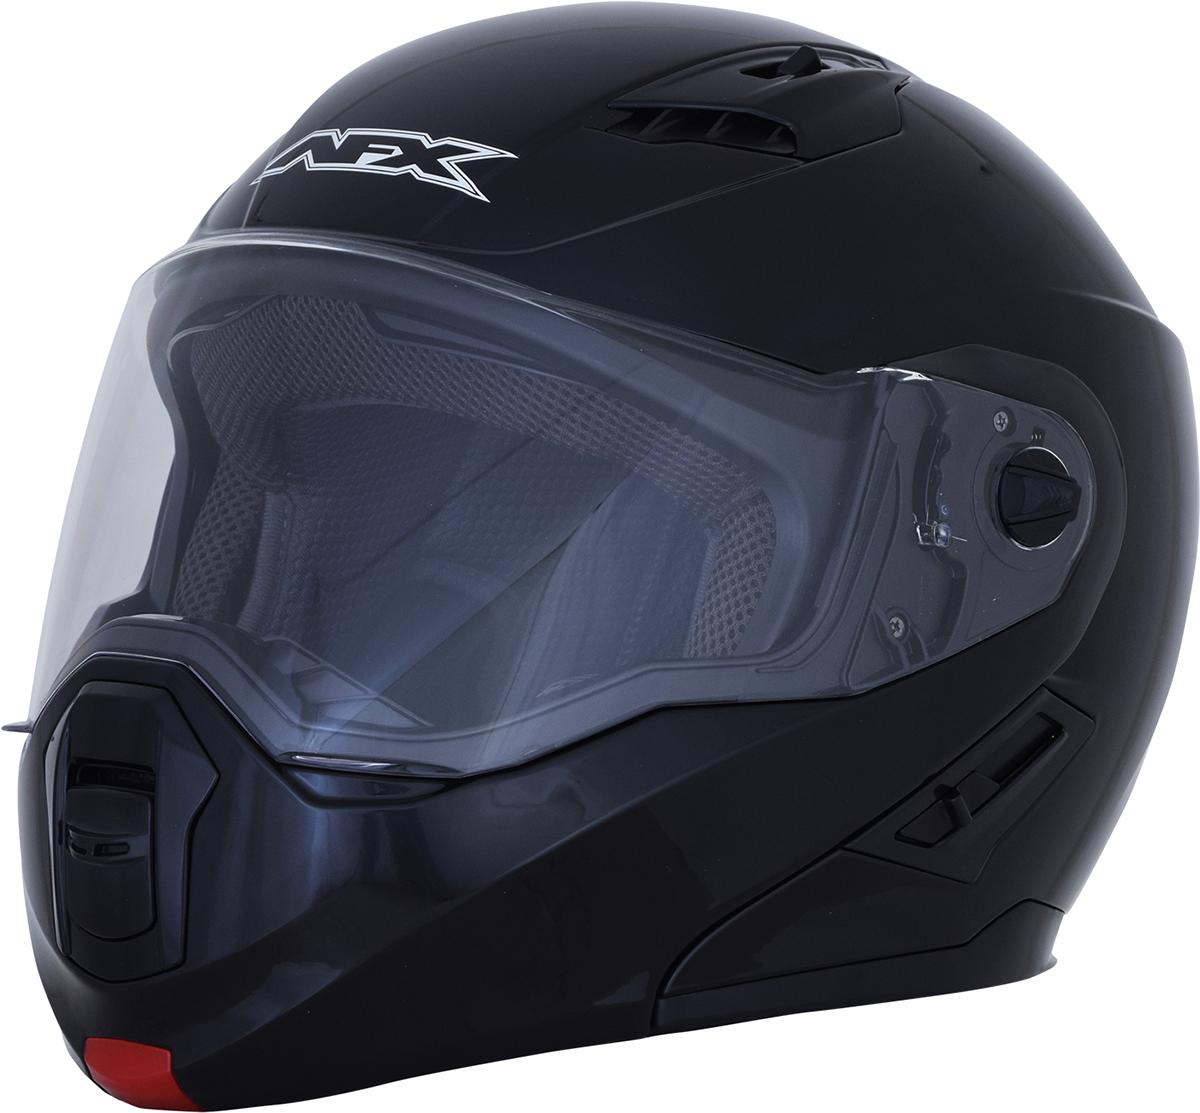 AFX FX111 Unisex Adult Fullface Motorcycle Riding Street Modular Racing Helmet